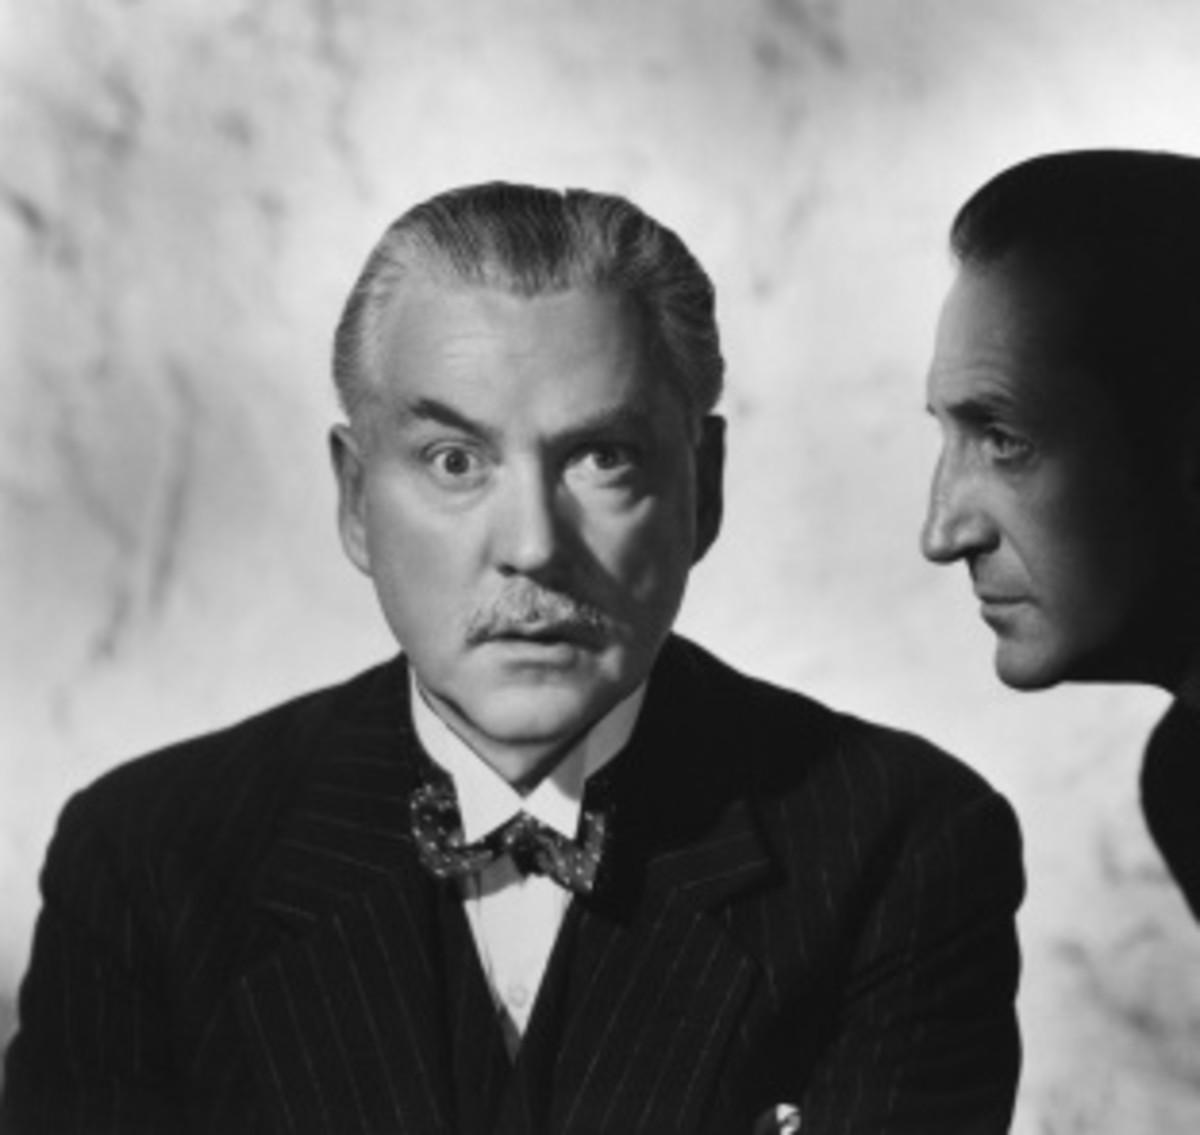 Nigel Bruce as Doctor Watson (Basil Rathbone on right)